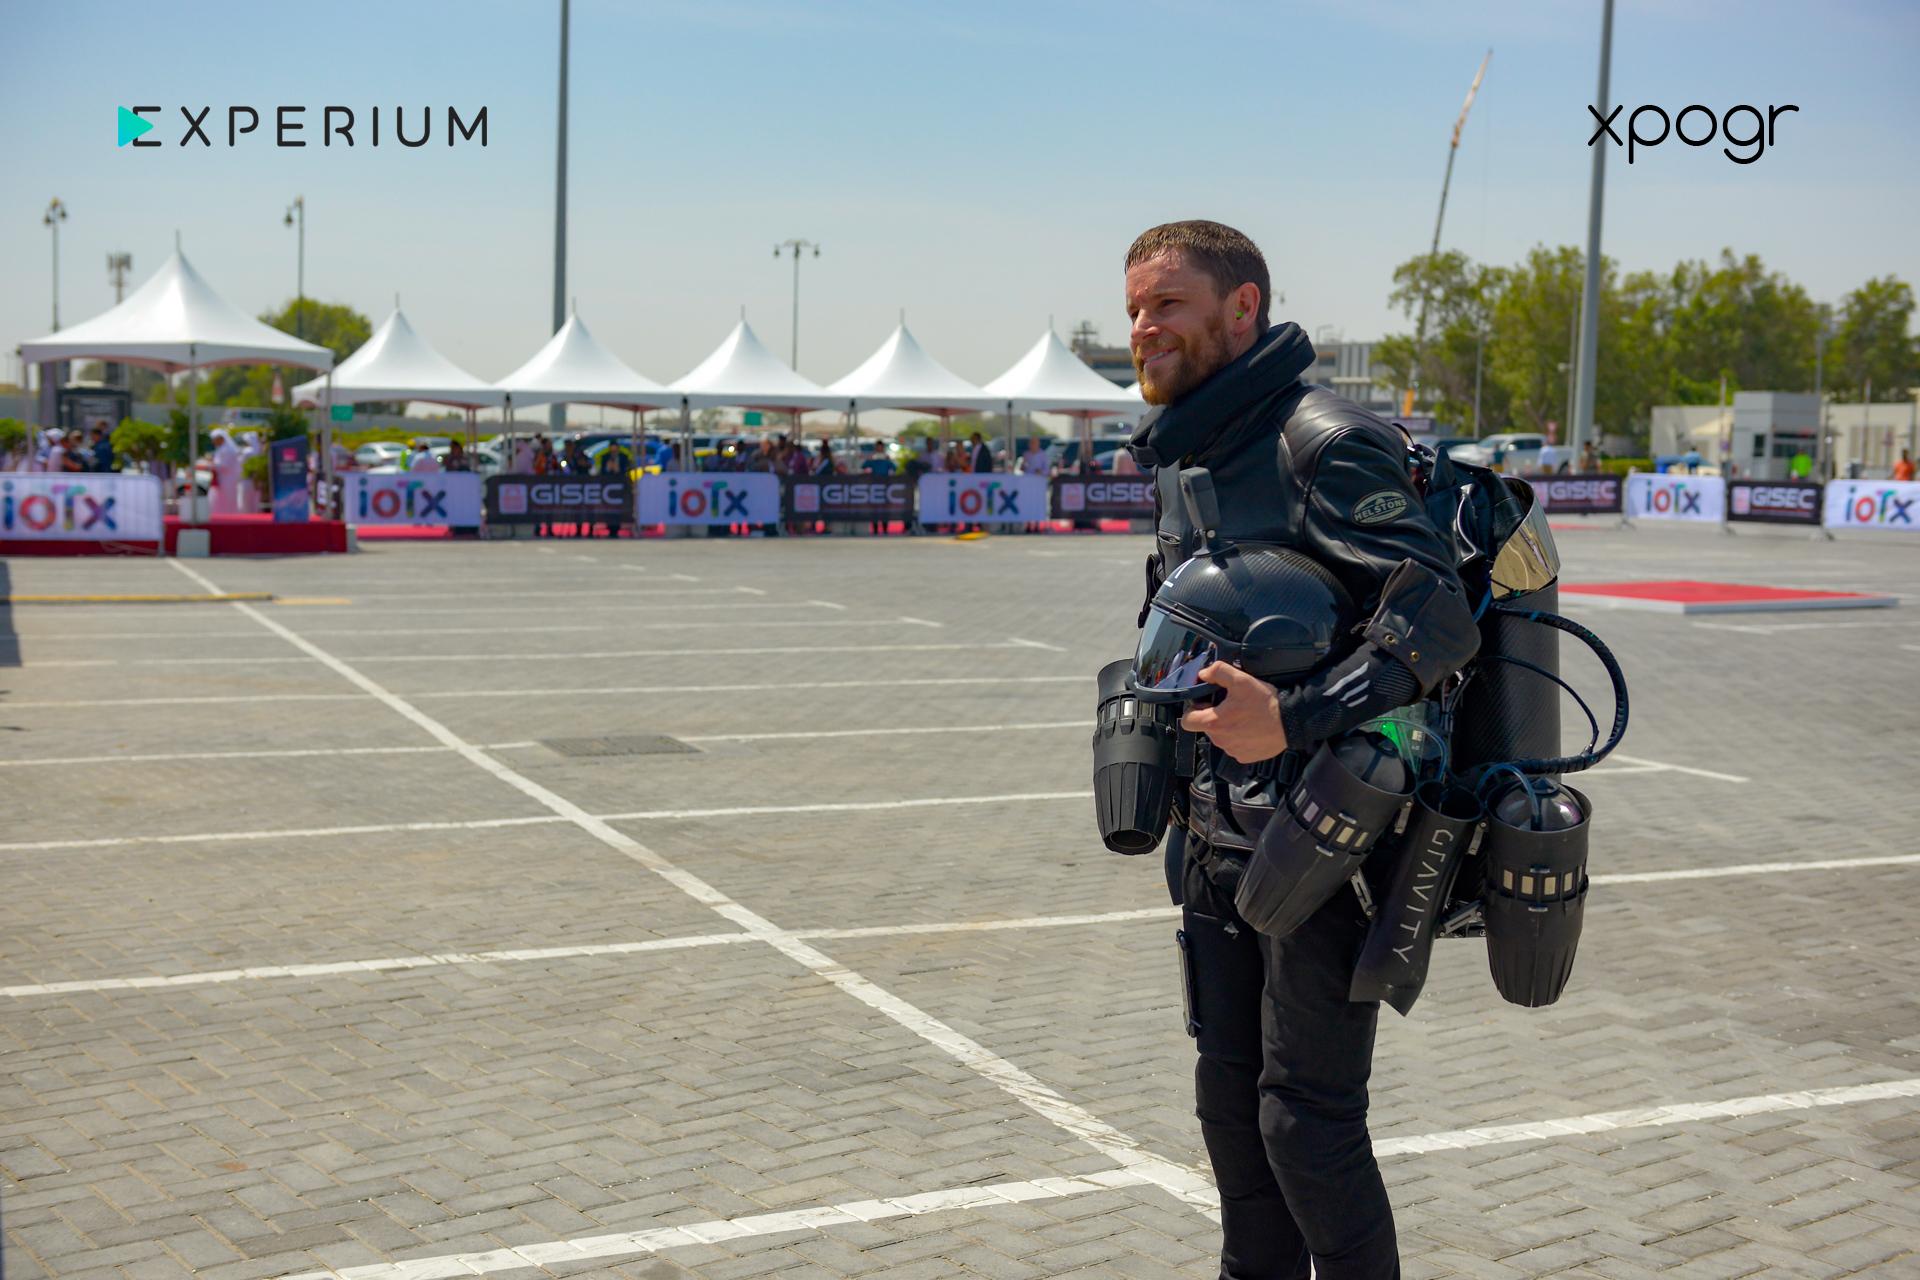 Real-life Iron Man takes flight in Dubai with xpogr